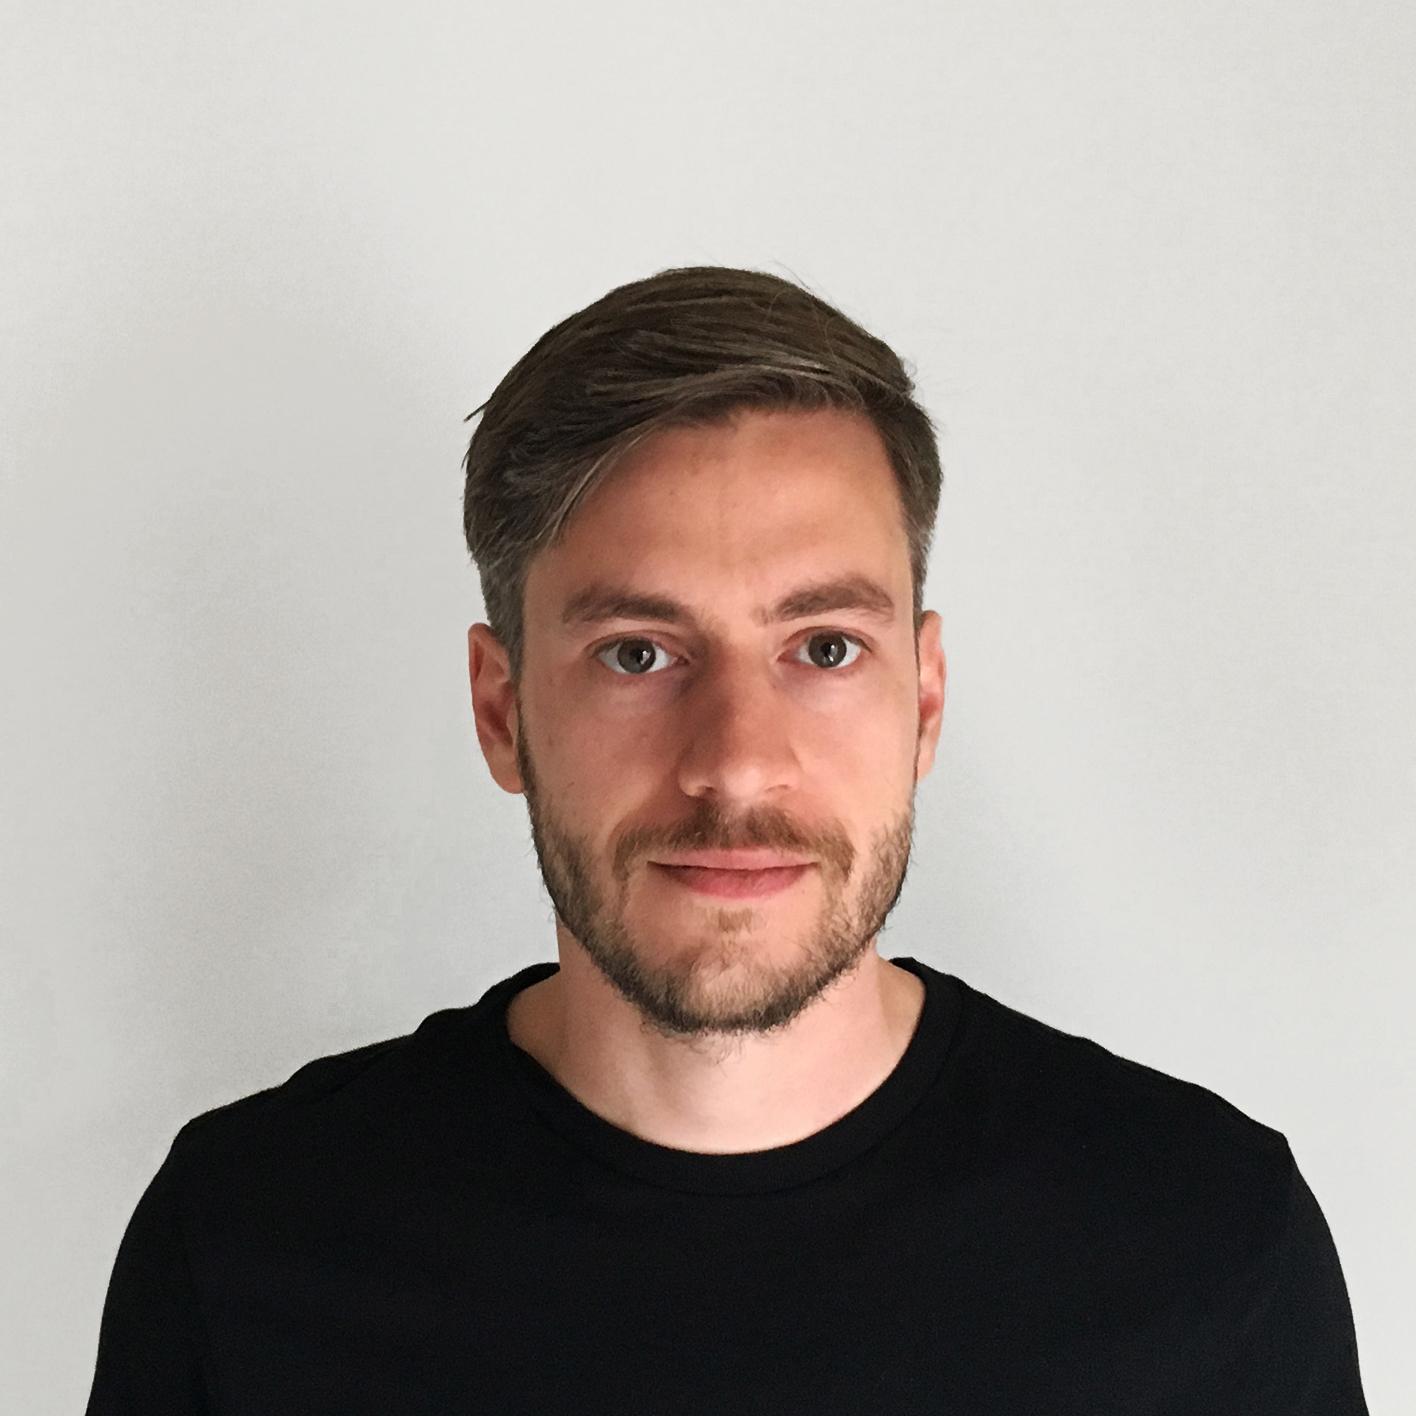 David Lindlbauer